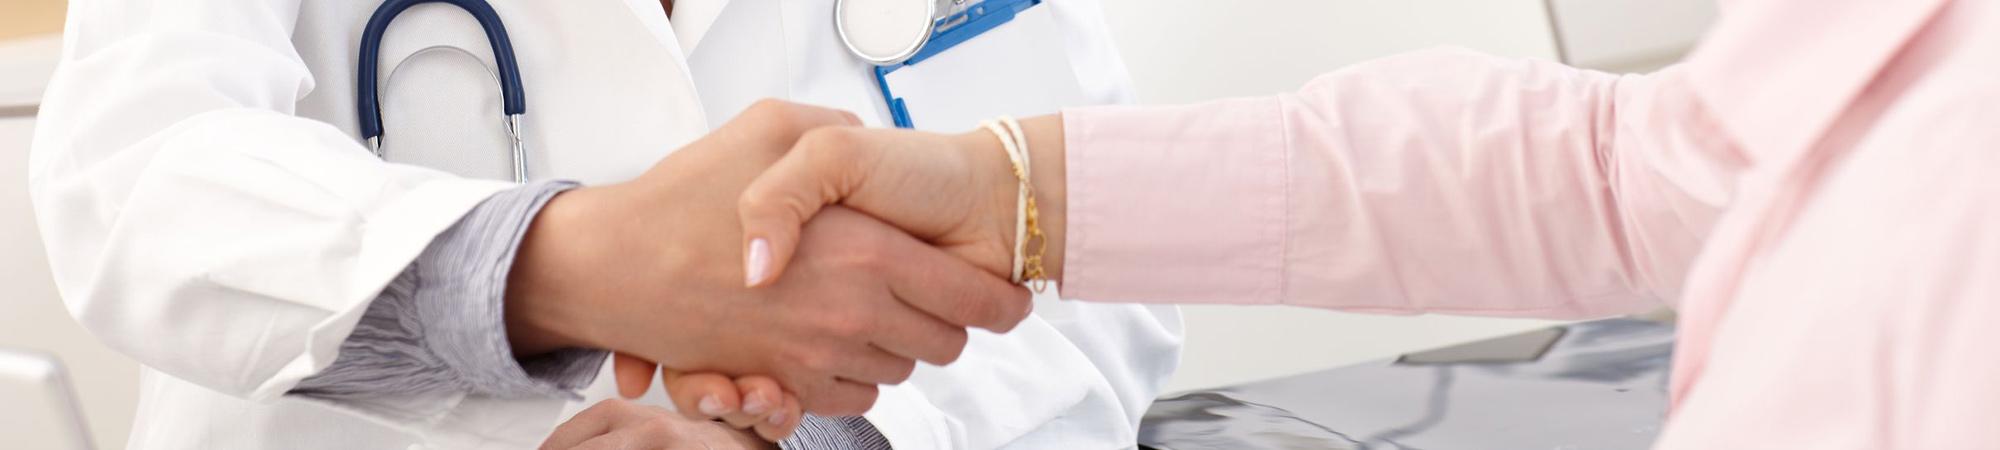 frauenarzt gynäkologin gevelsberg kontakt